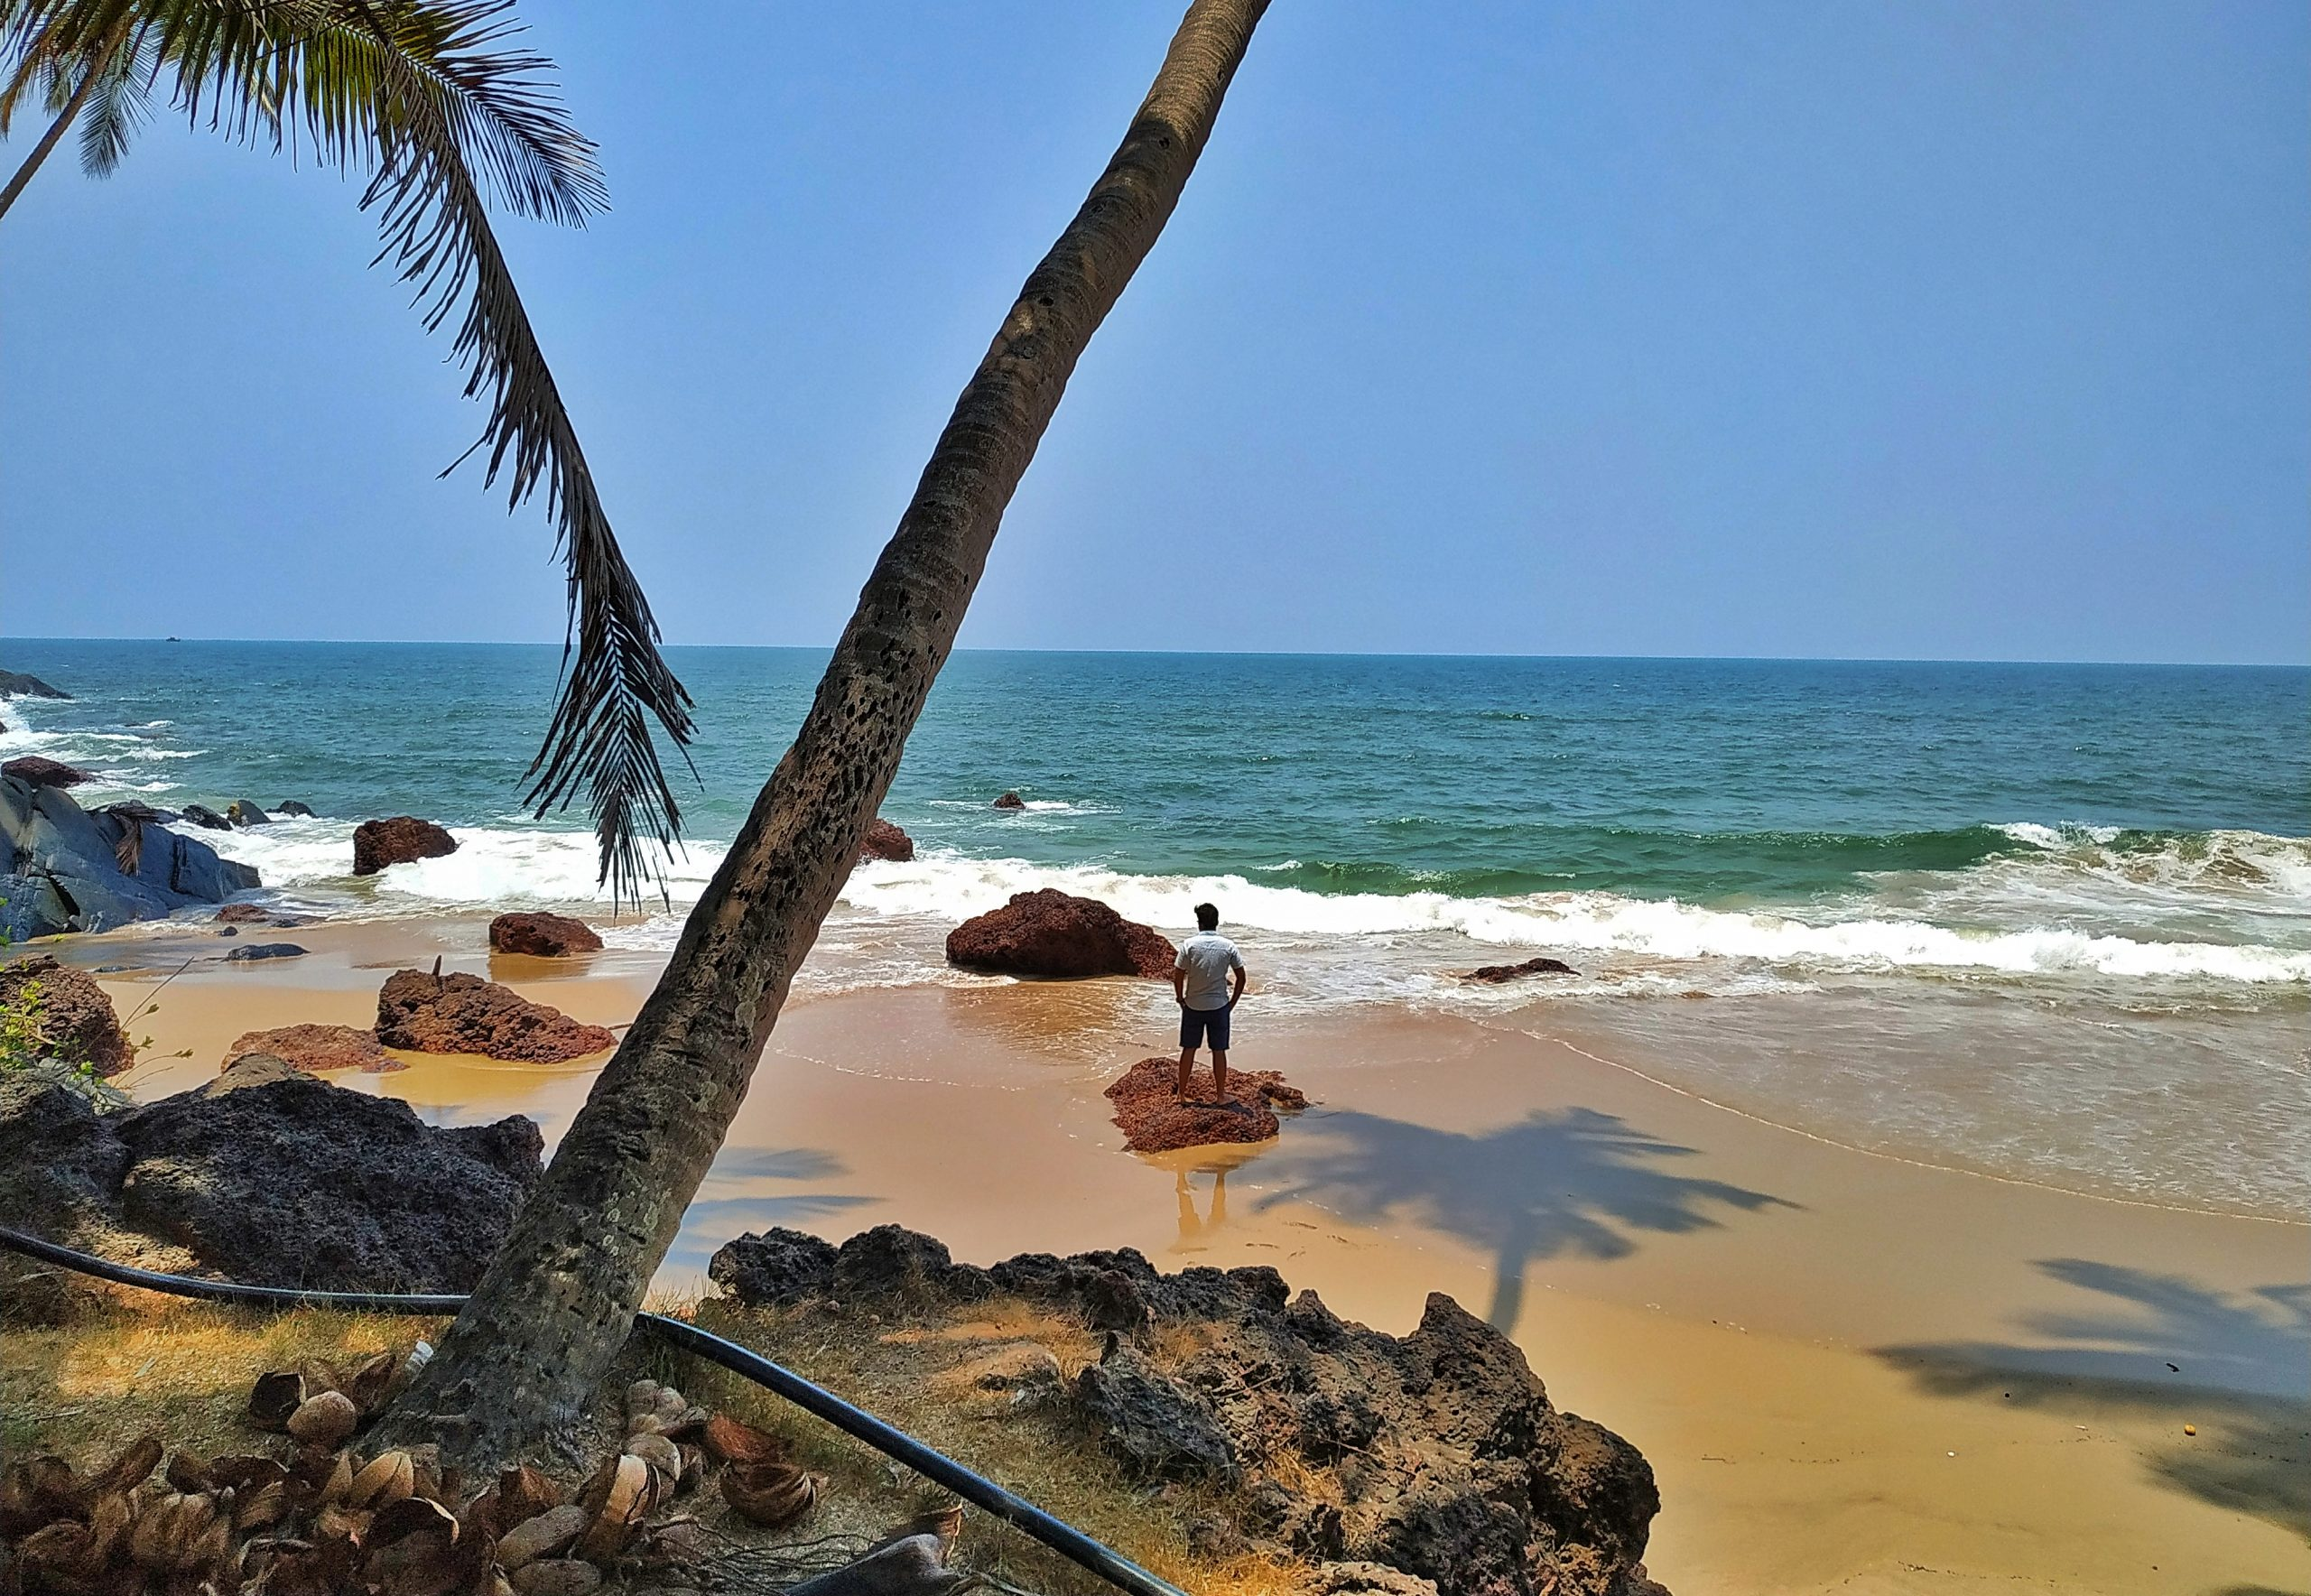 Beach of kokan in Sindhudurg.